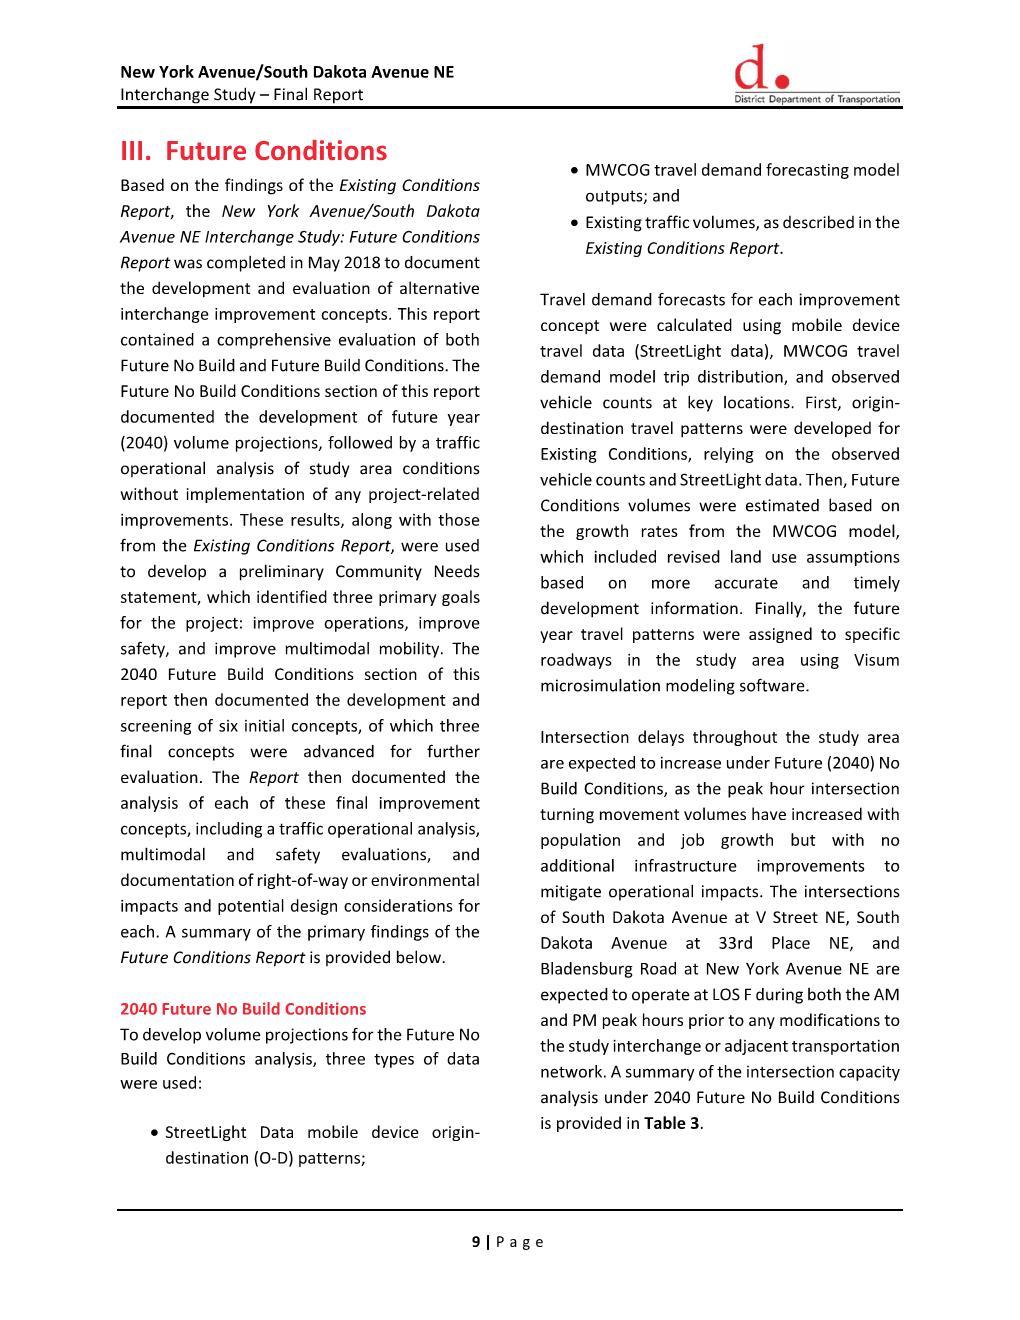 Futute conditions DDOT Page 002